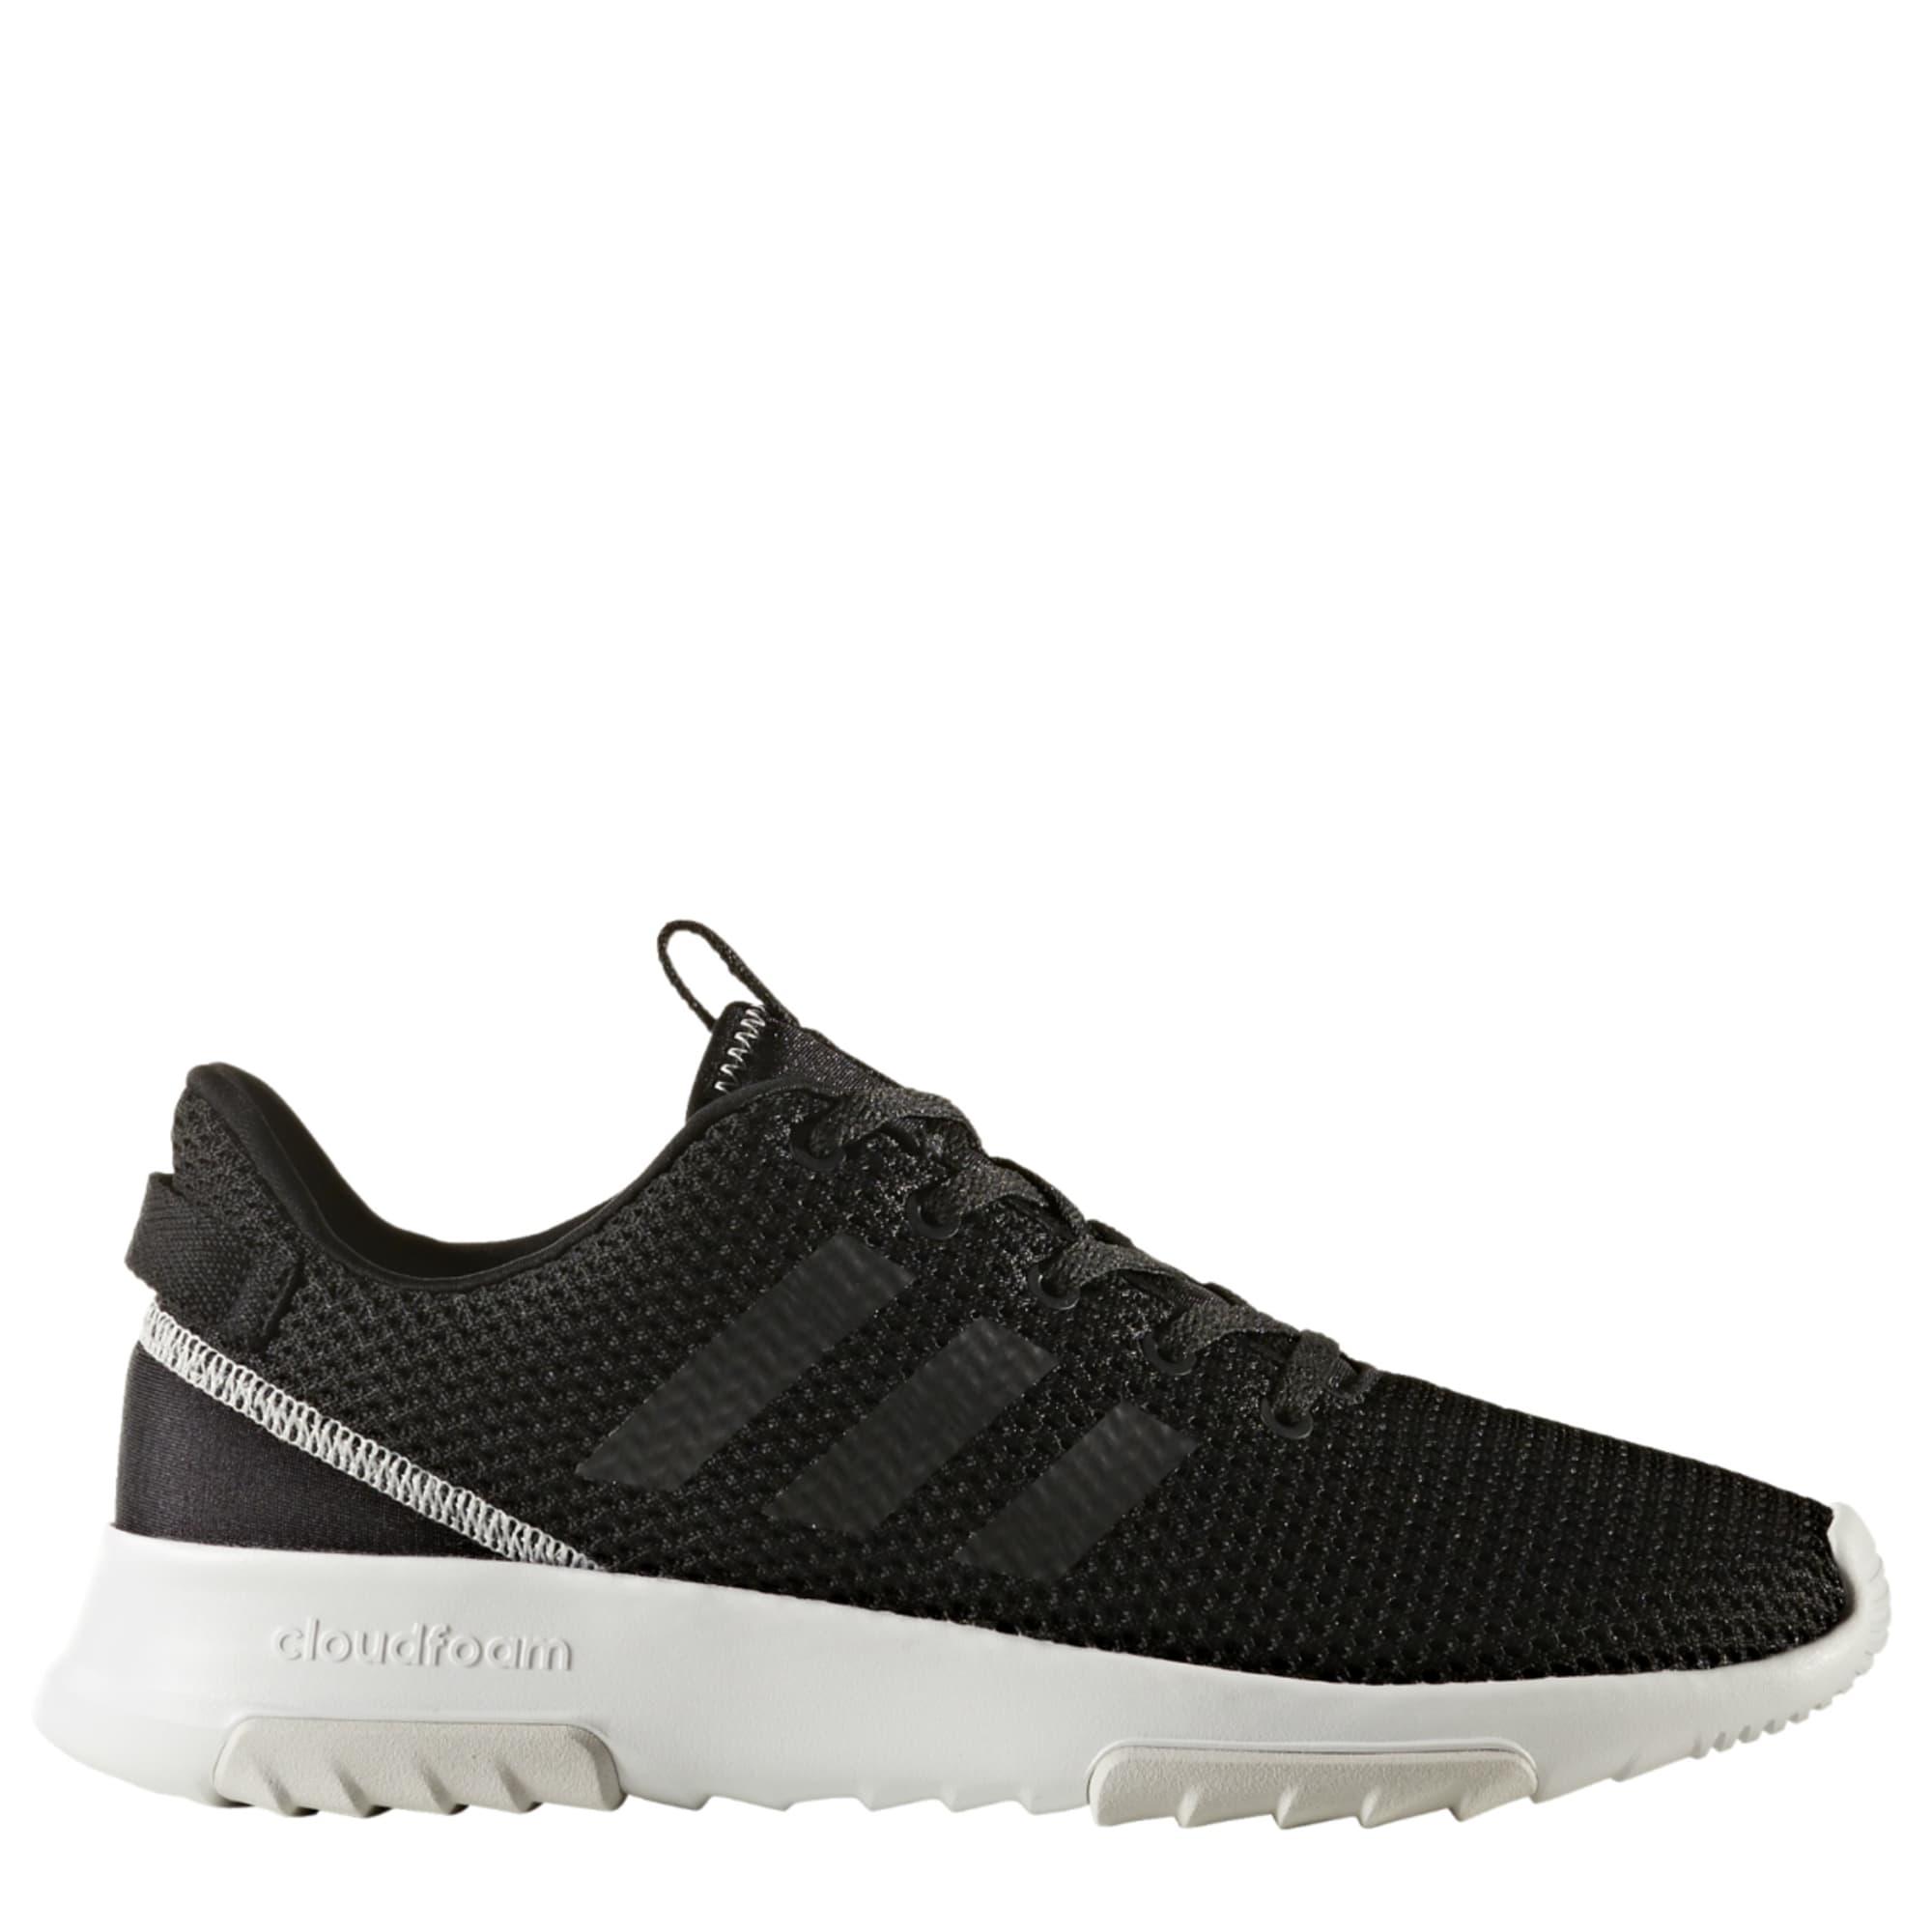 ADIDAS Women's Neo Cloudfoam Racer TR Running Shoes, Black/Grey